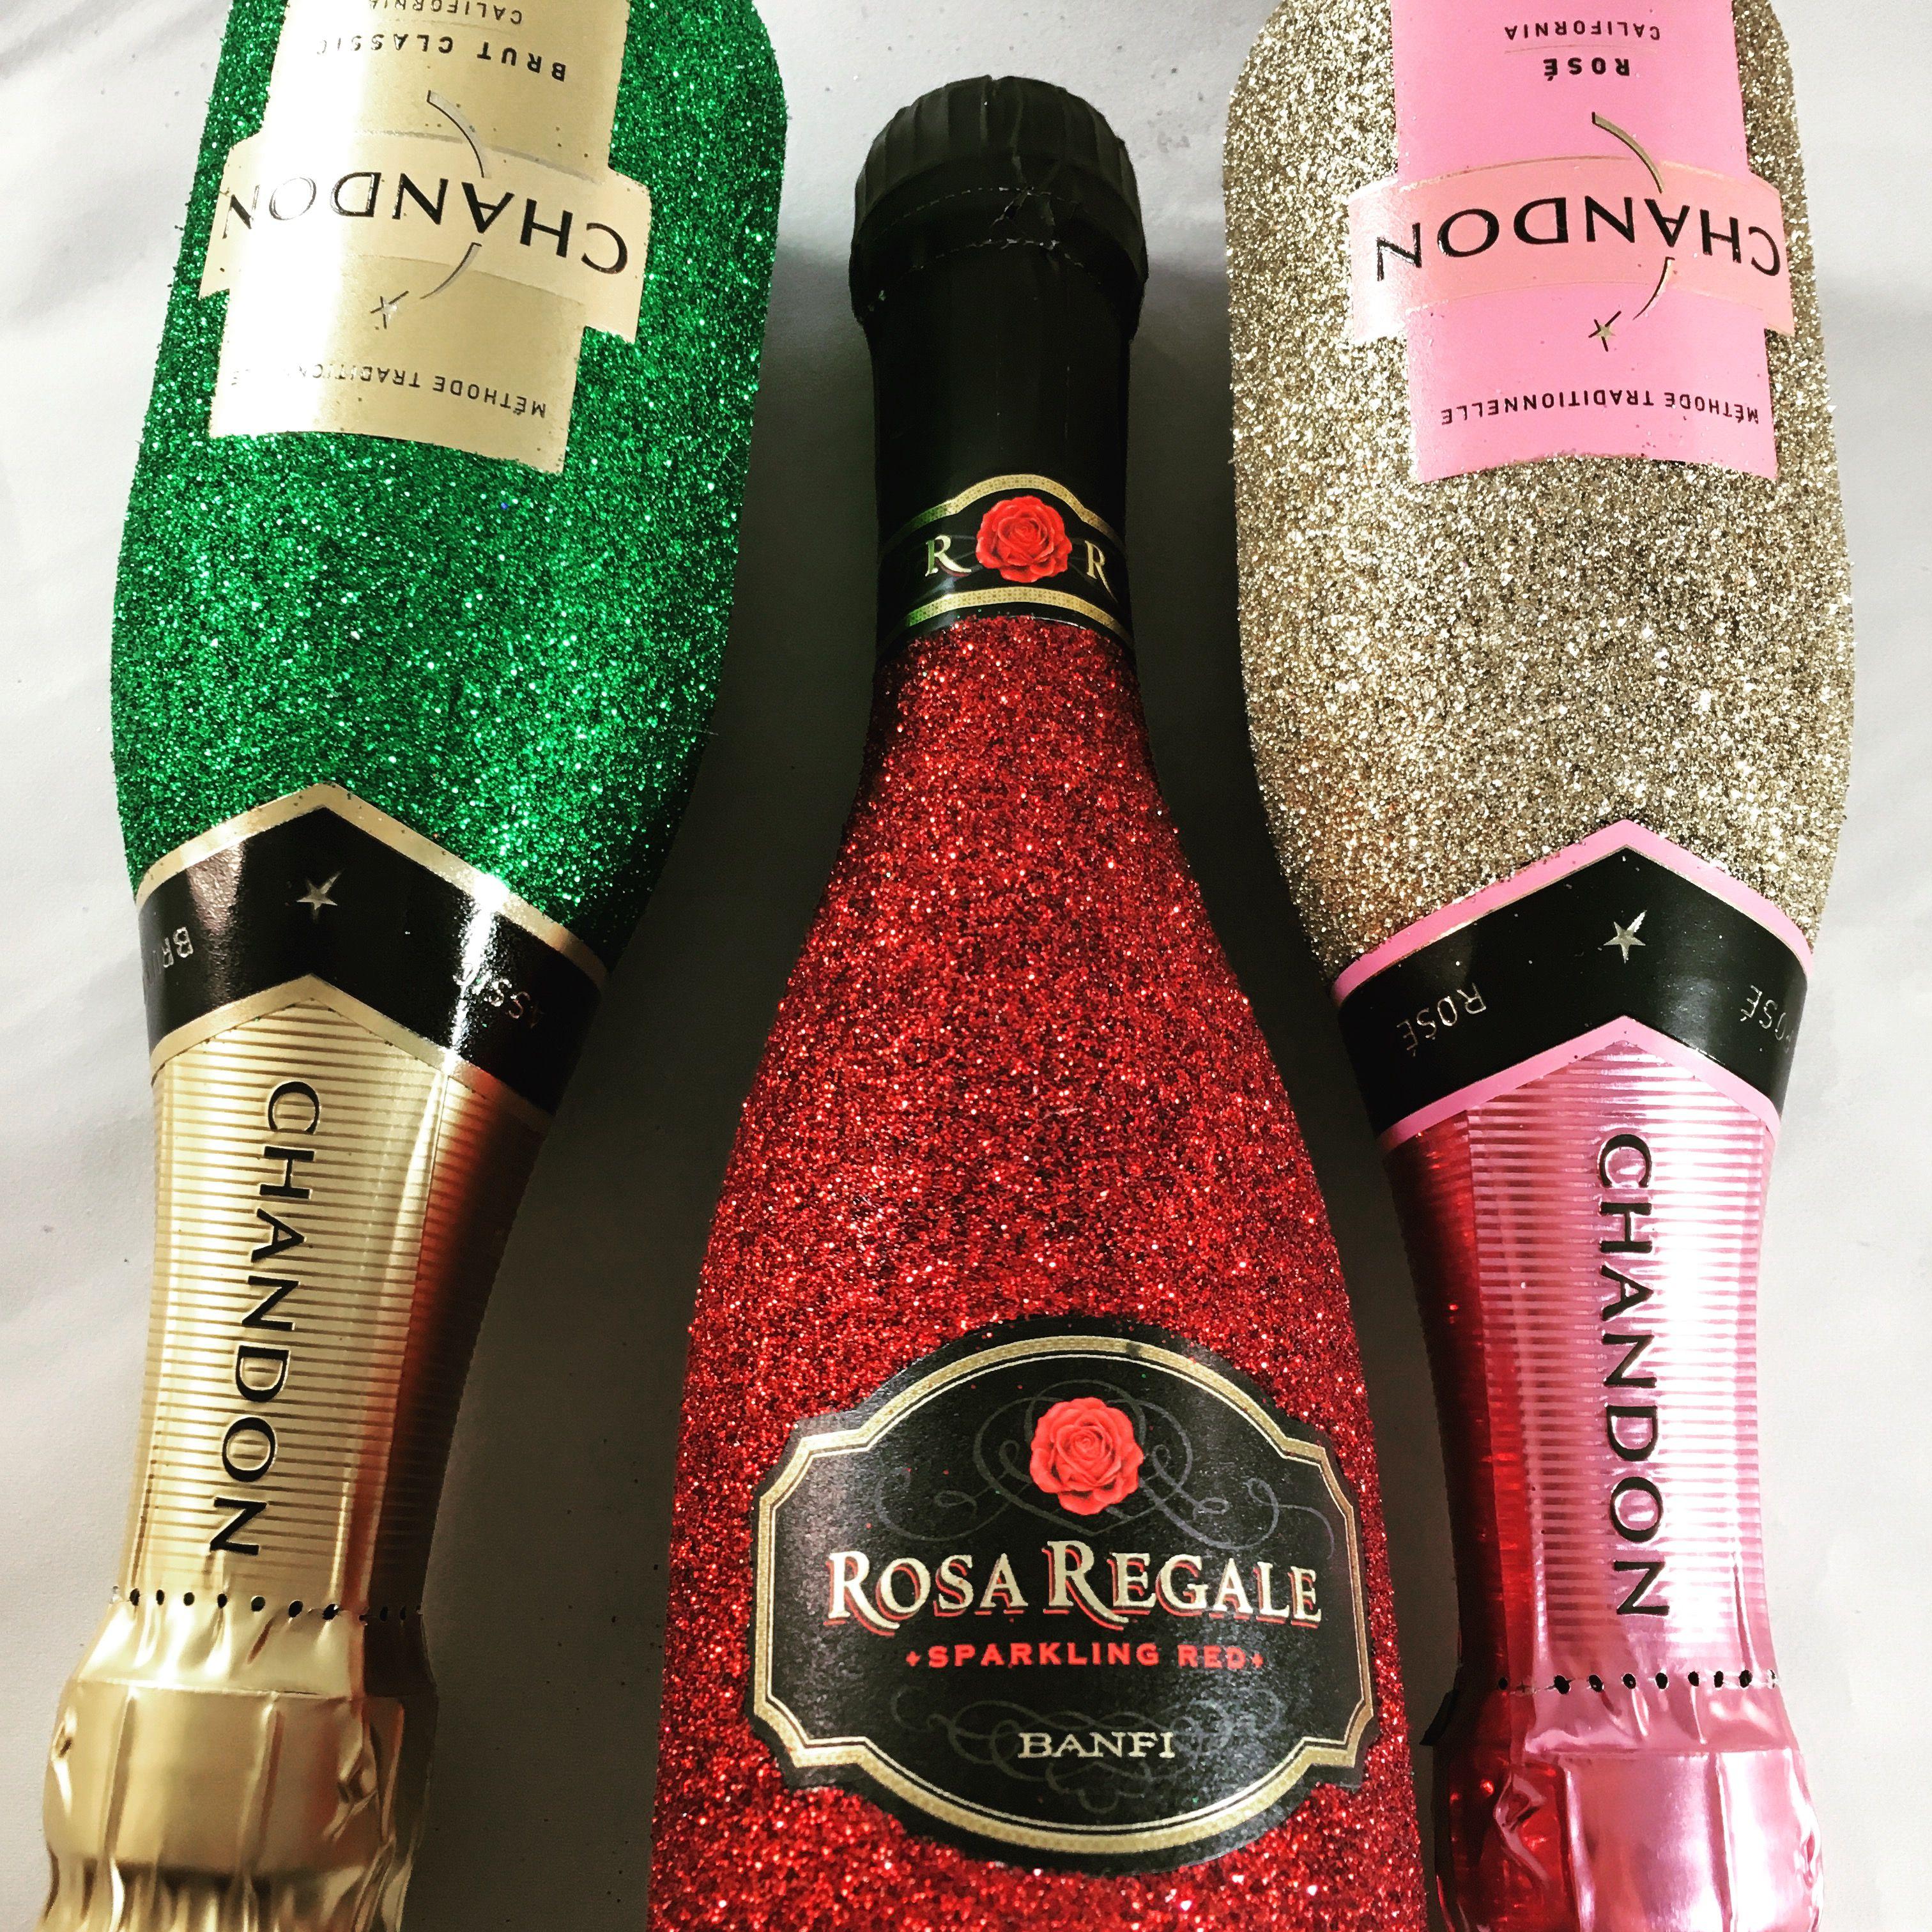 Mini Champagne Bottles L To R Chandon Brut In Green Glitter Rosa Regale In Crimson Red Glitter And Cha Glitter Wine Bottles Glitter Bottle Glitter Bottle Diy